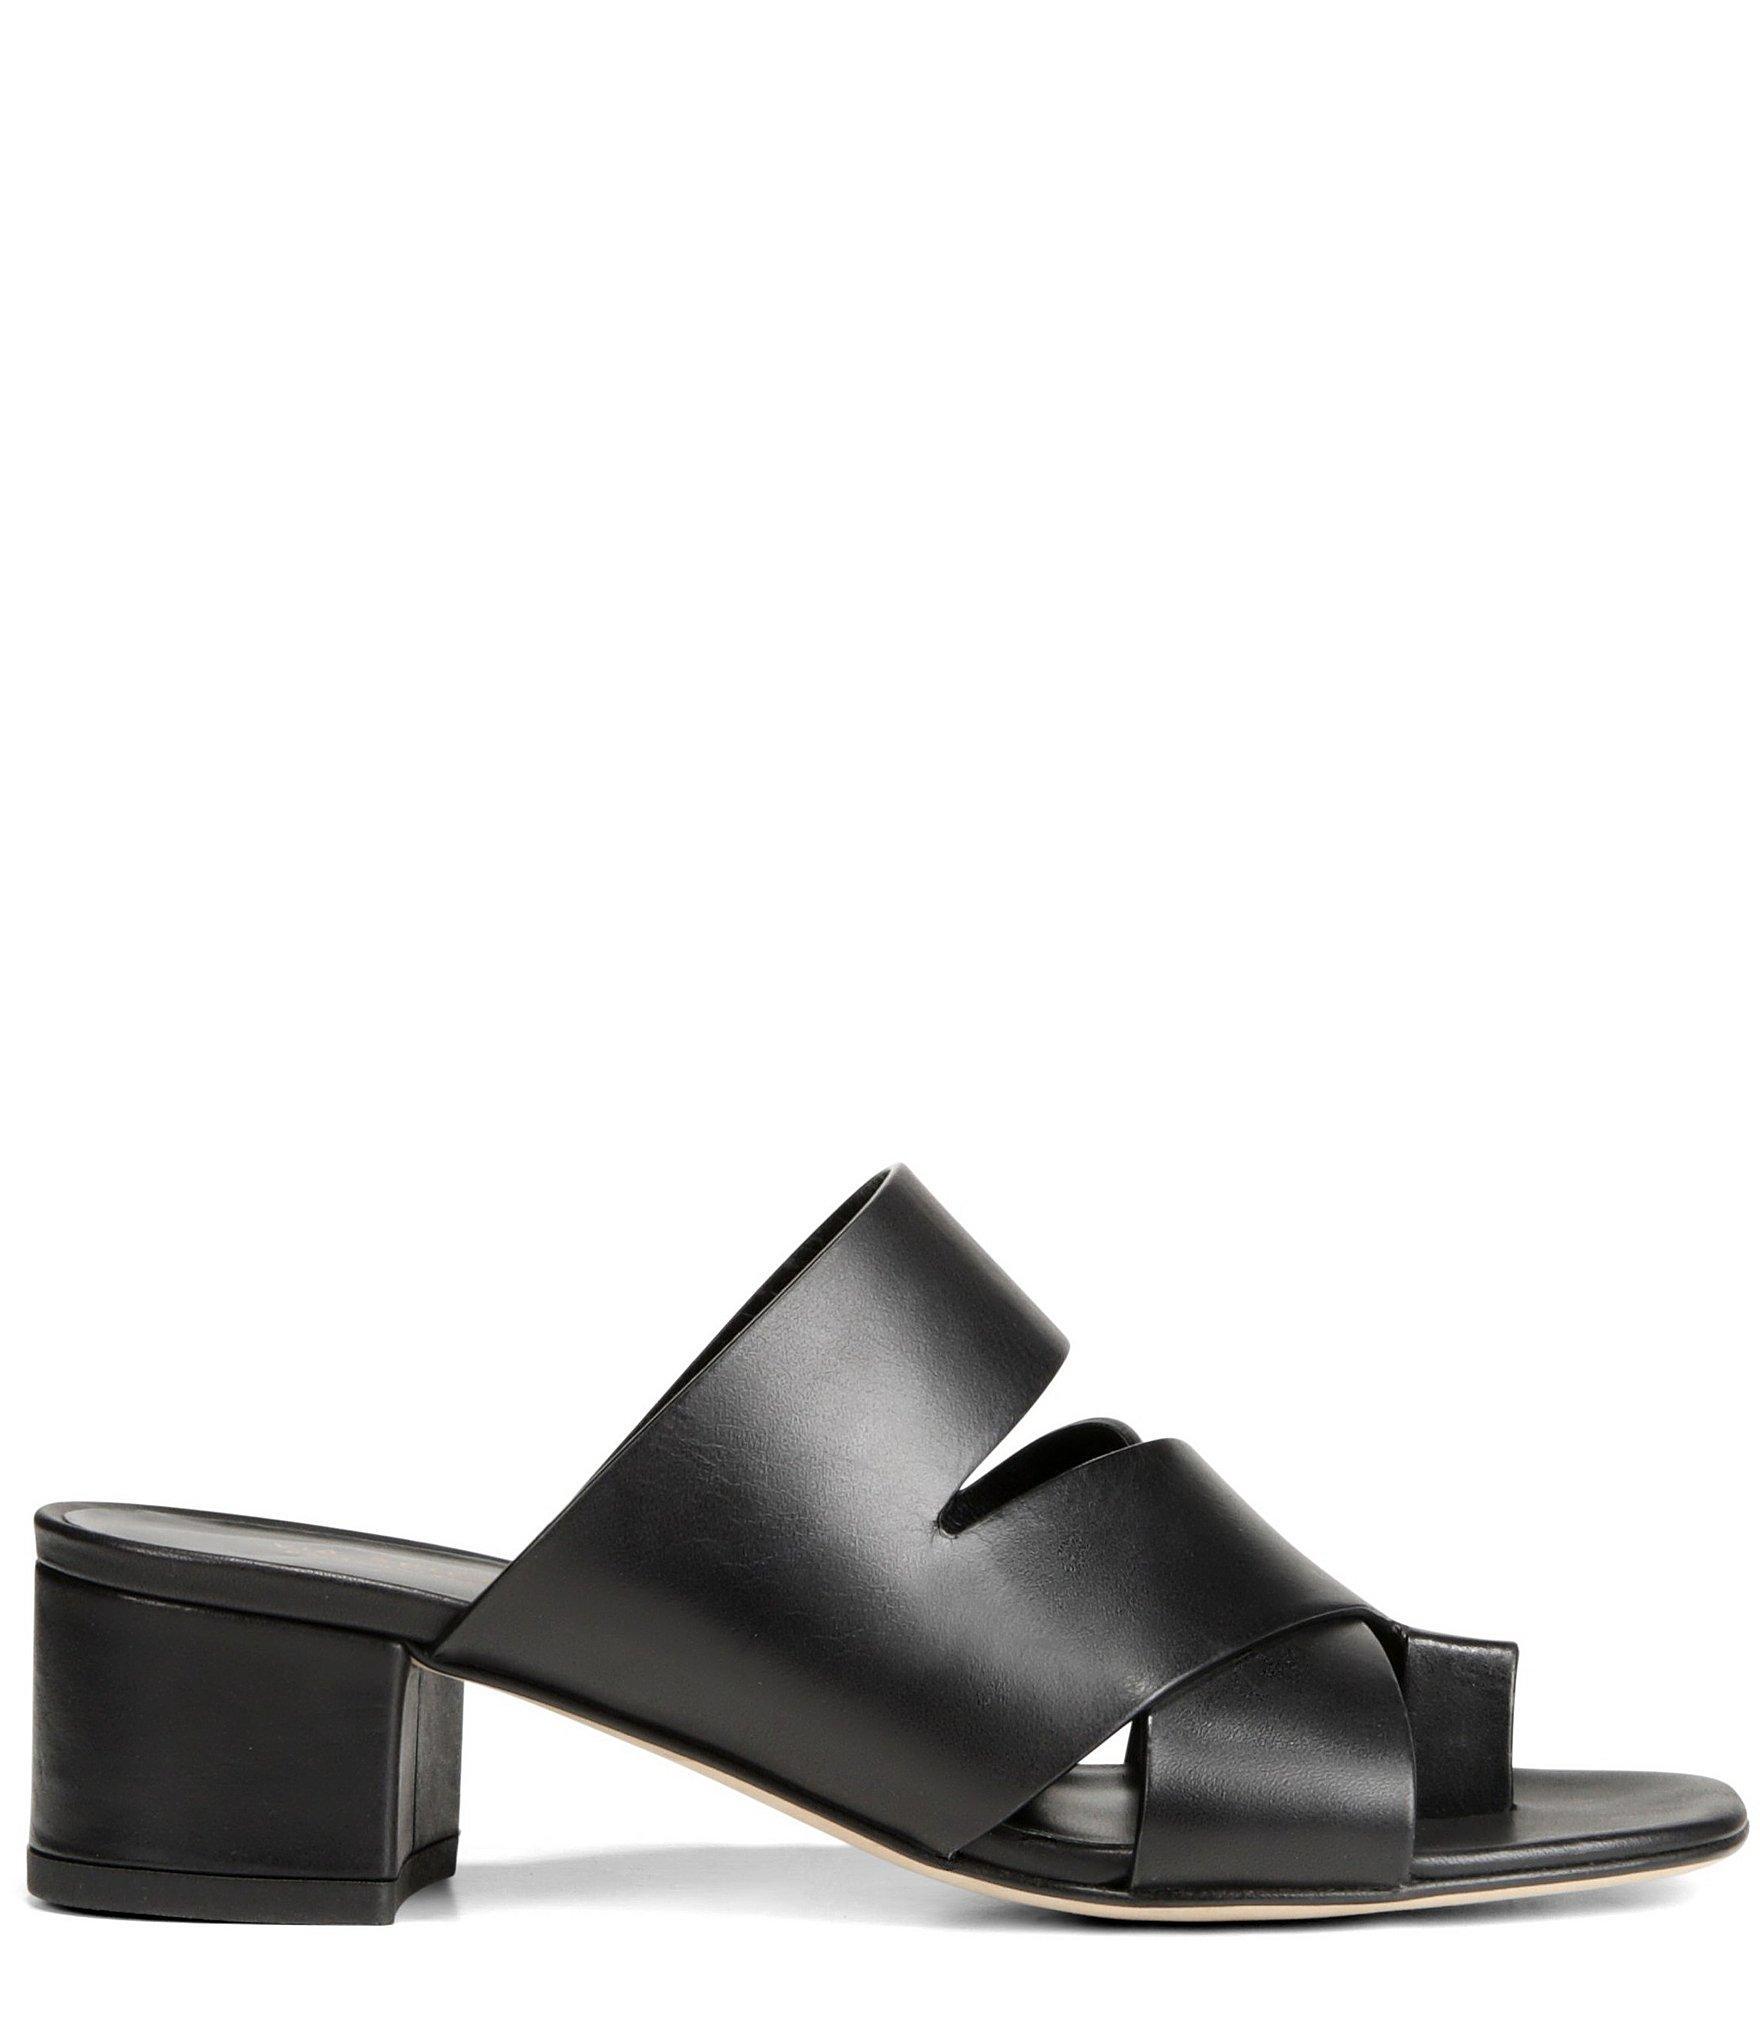 93de37d0628 Via Spiga - Black Women s Fae Leather Block Heel Sandals - Lyst. View  fullscreen